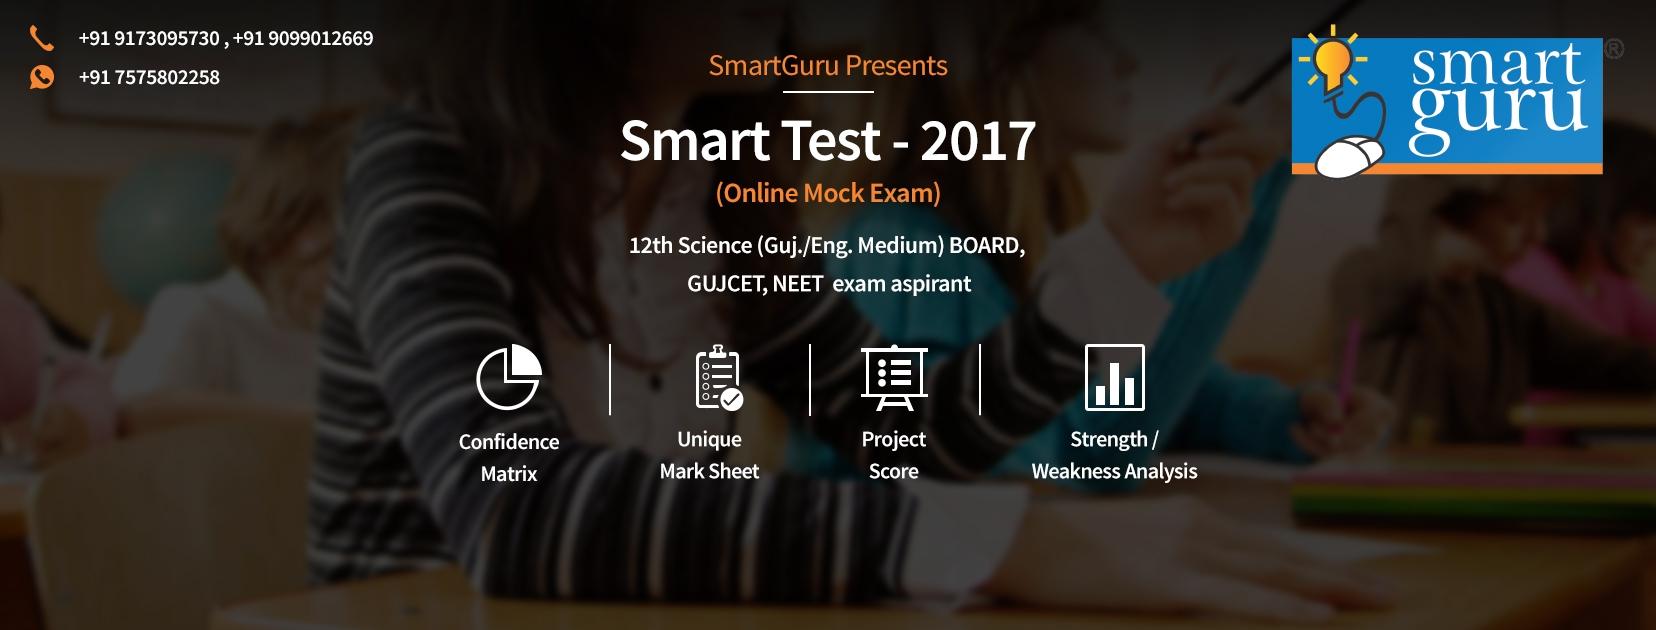 Smart Guru (@smartguru) Cover Image